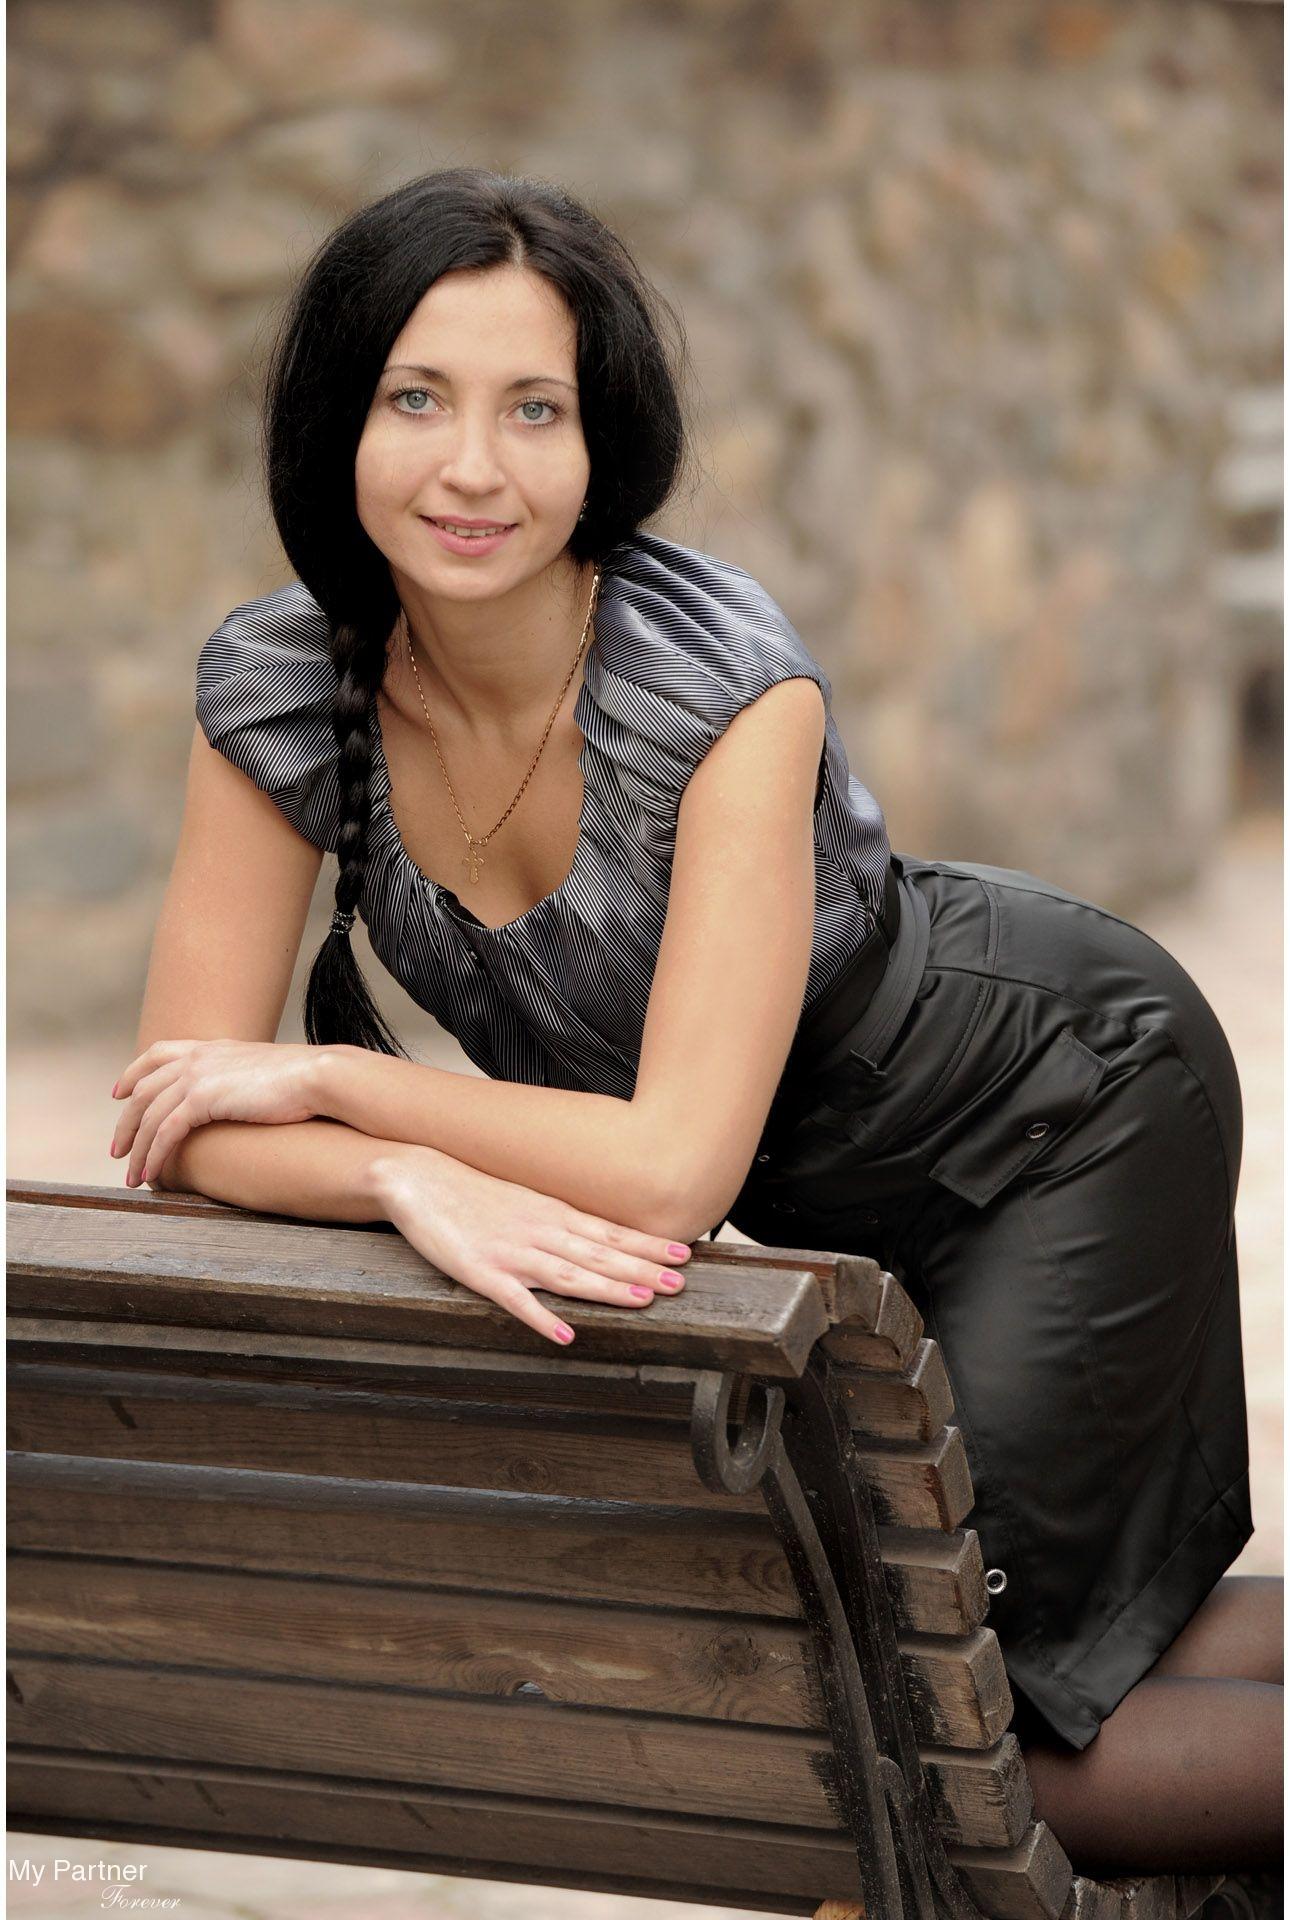 Mariupol dating agency